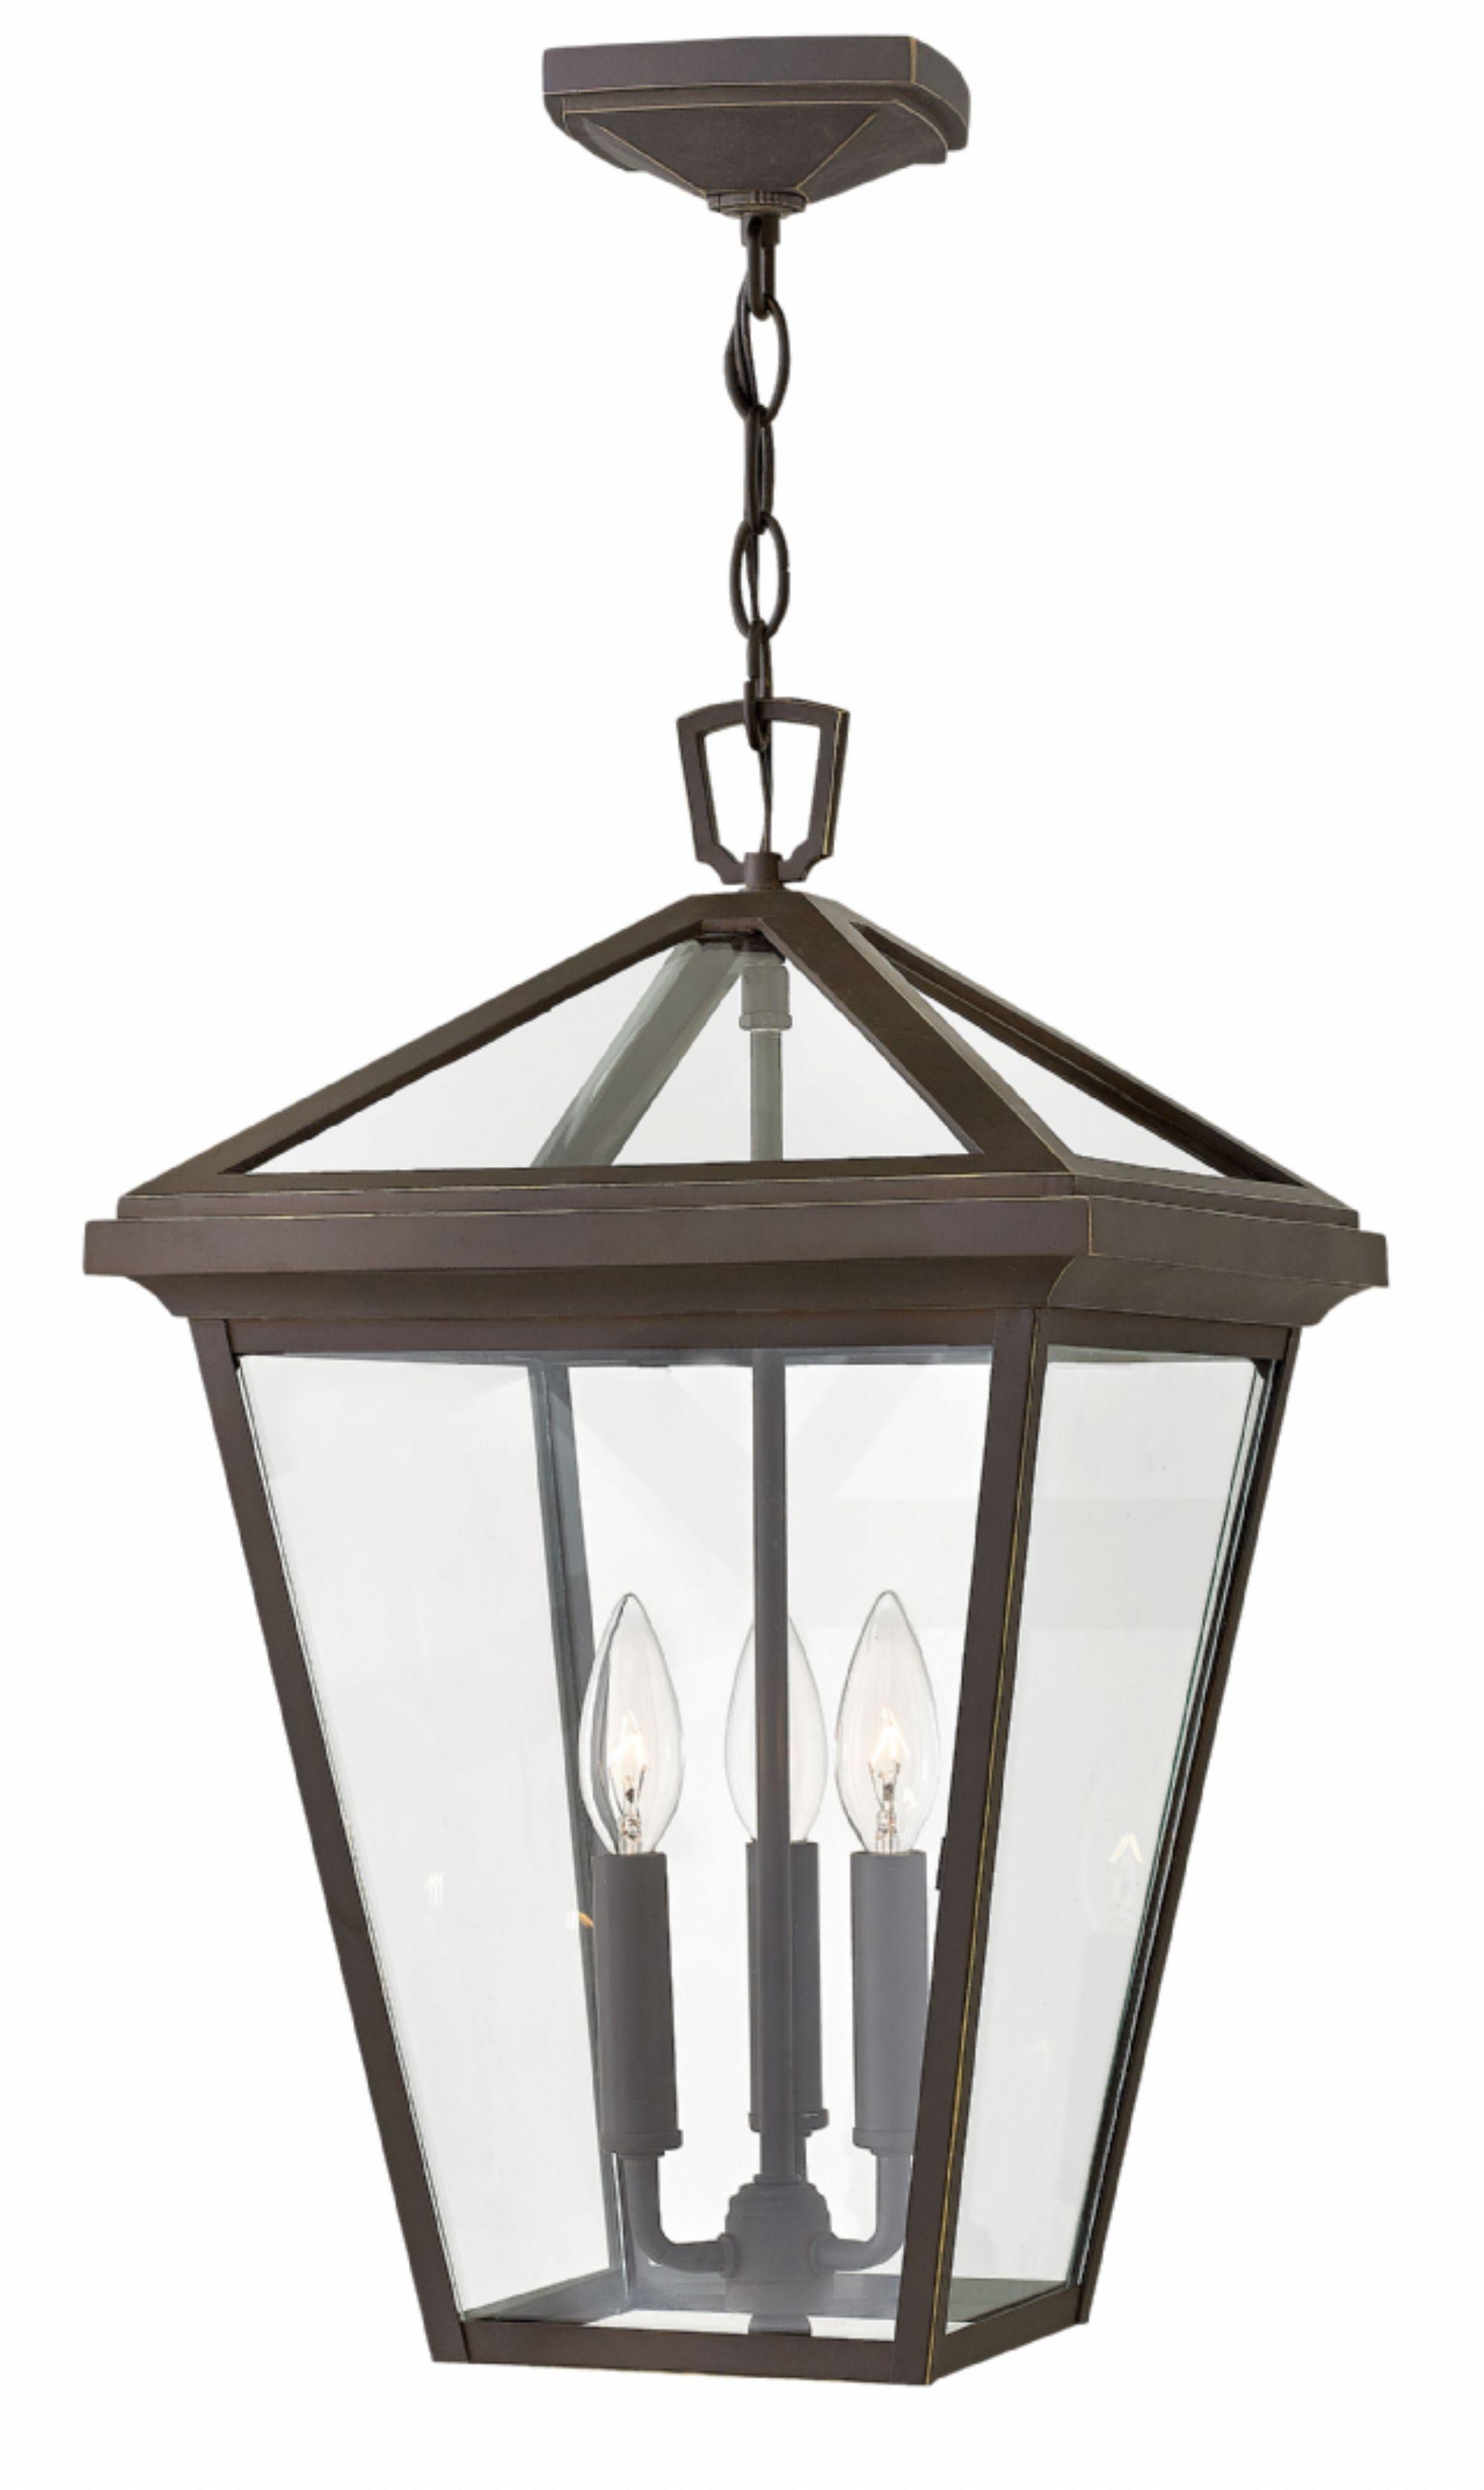 Hinkley Lighting – Alford Place 2562oz | 1205 Lighting | Pinterest Regarding Contemporary Hanging Porch Hinkley Lighting (View 7 of 15)